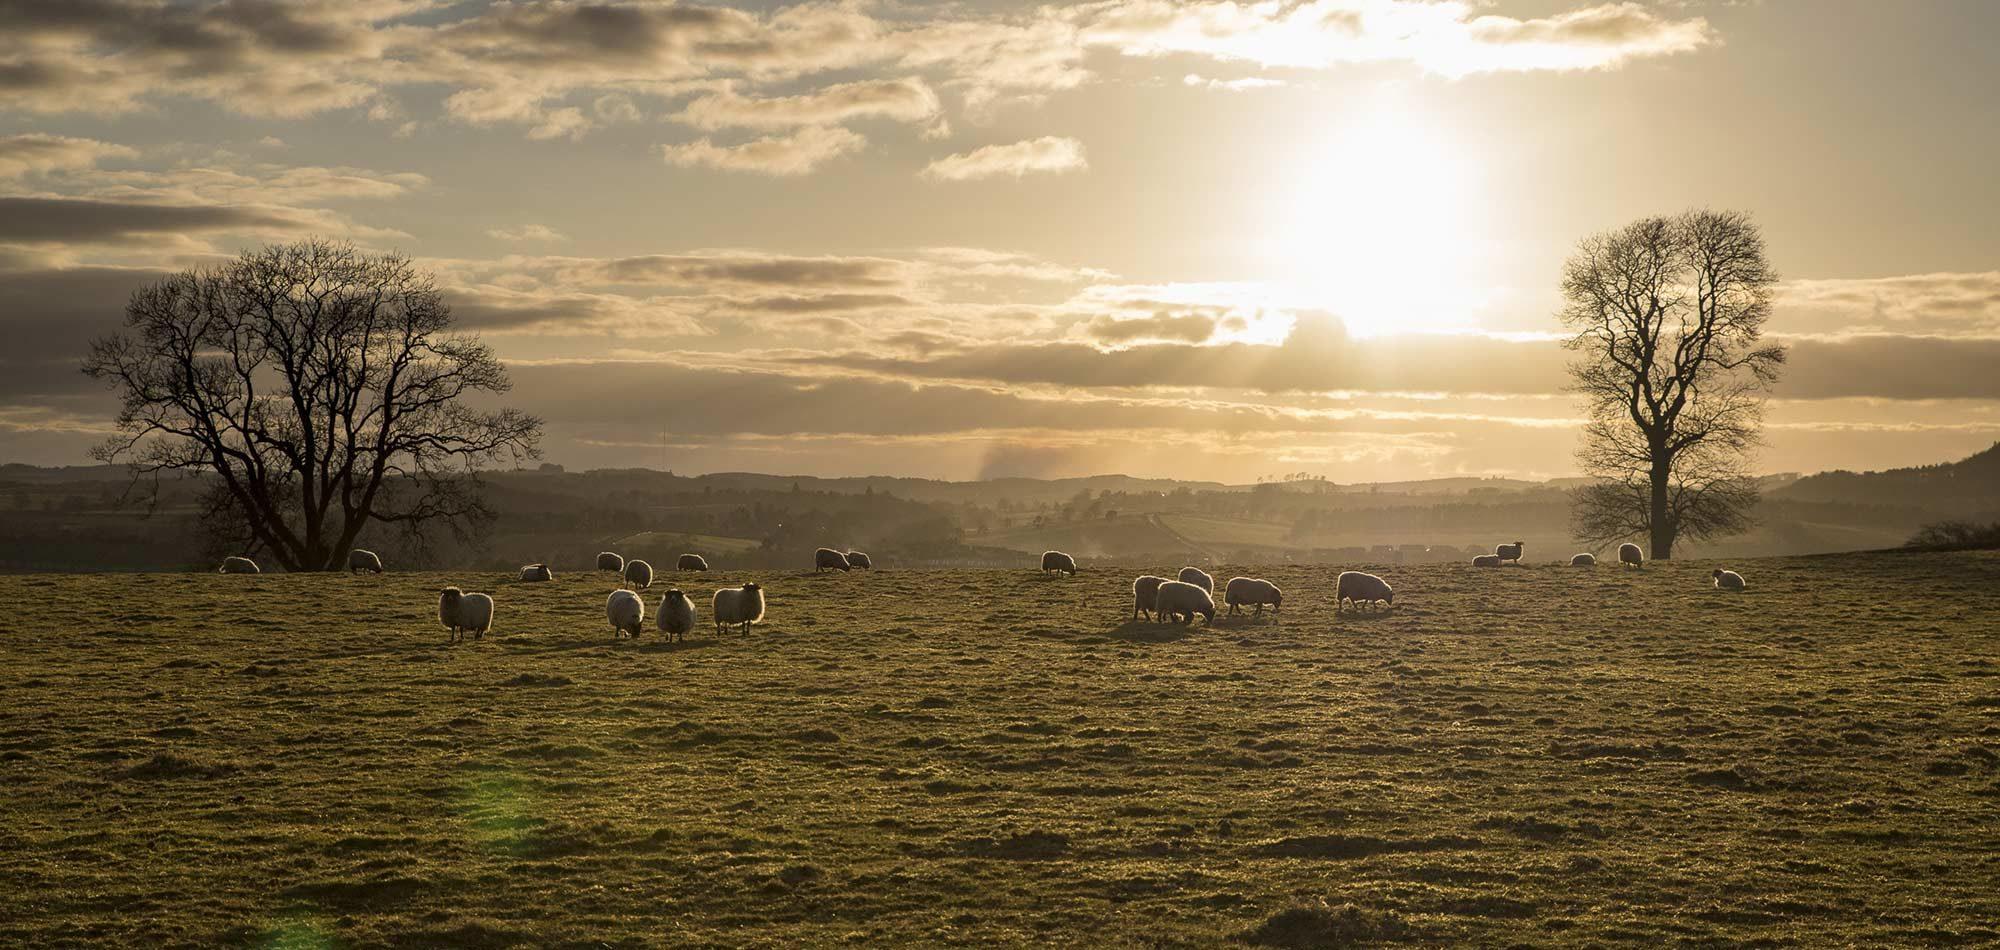 mouton ecosse roadtrip sir edwards